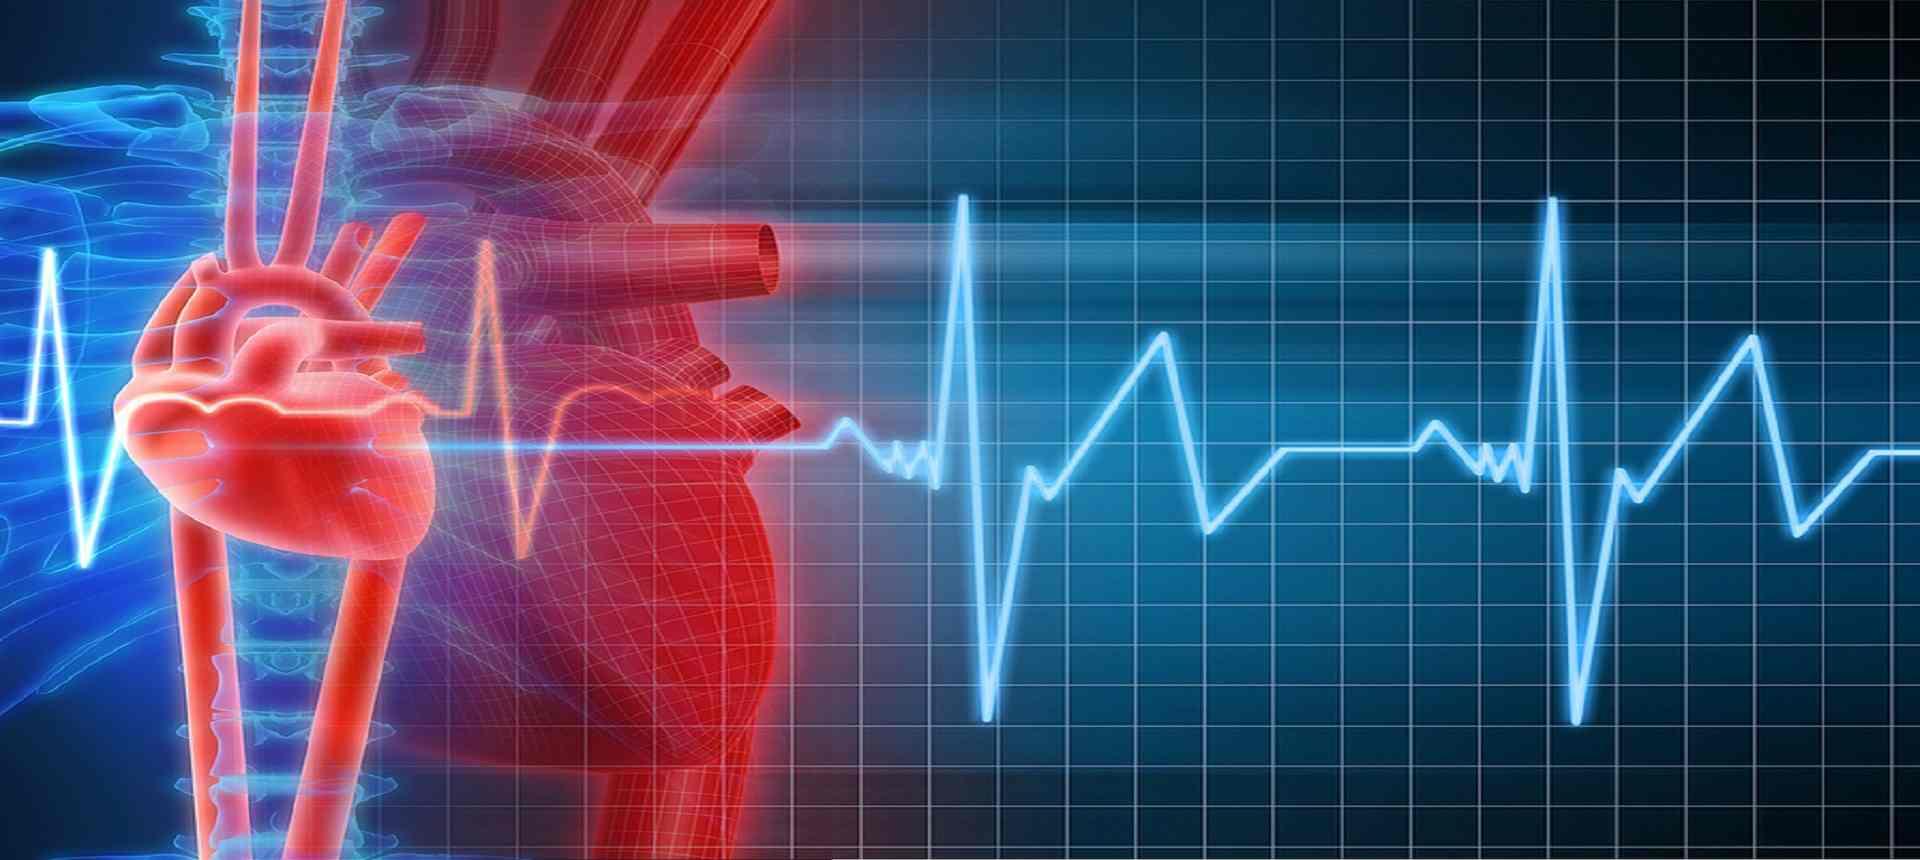 attività cardiaca